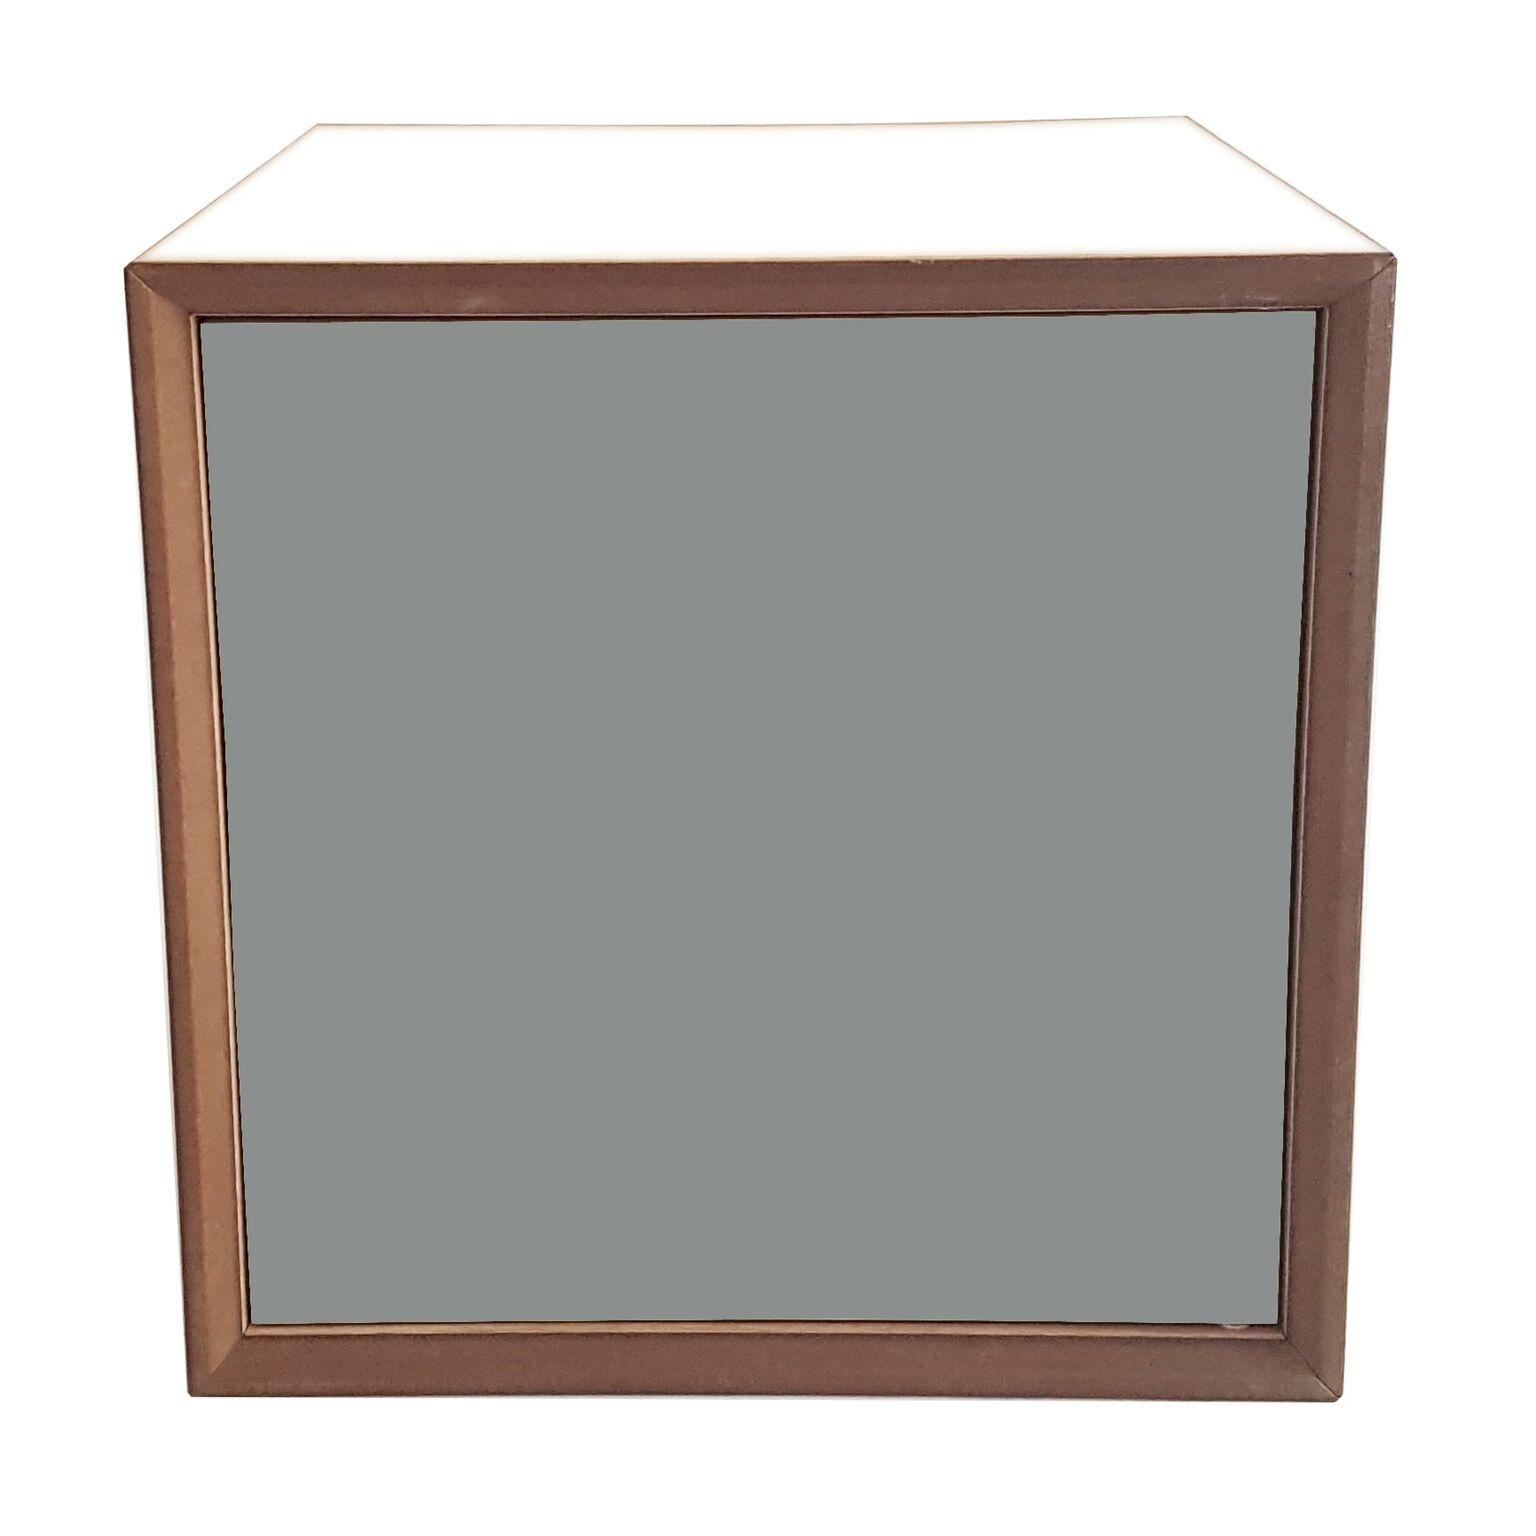 Dulap modular Pixel Dark Grey / White l40xA40xH40 cm